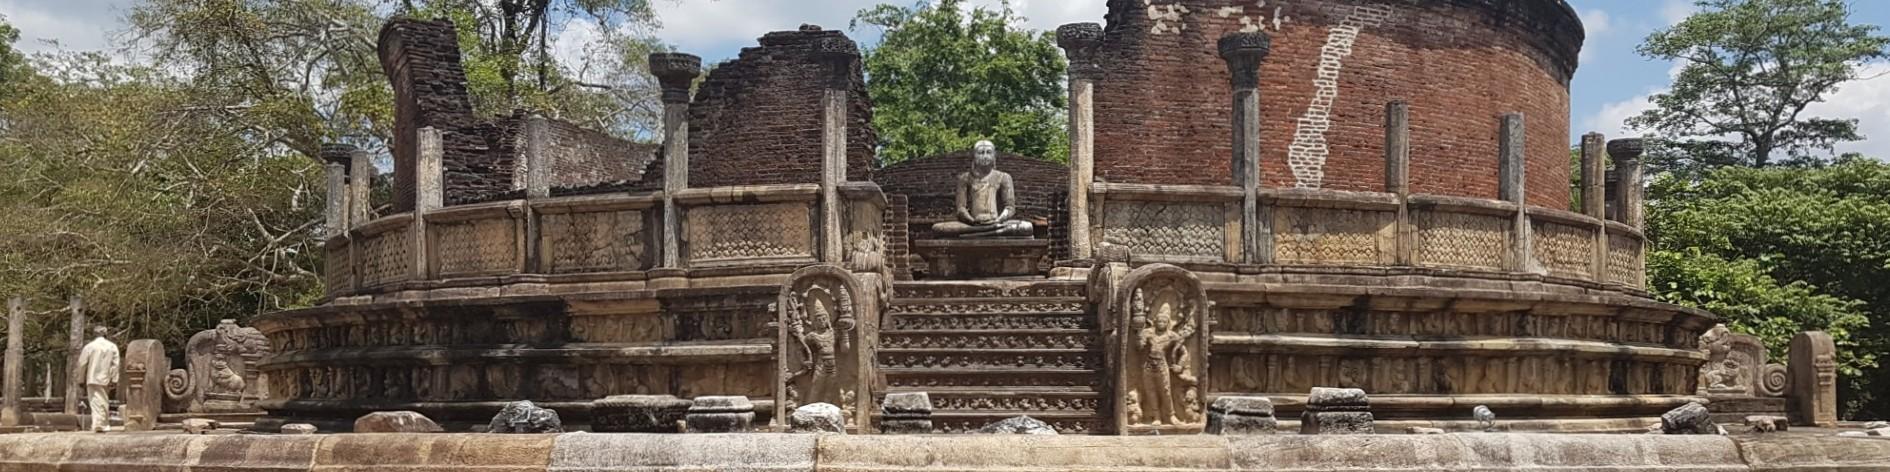 Hatadage (40), Polonnaruwa Historical Site, Polonnaruwa District, North Central Region